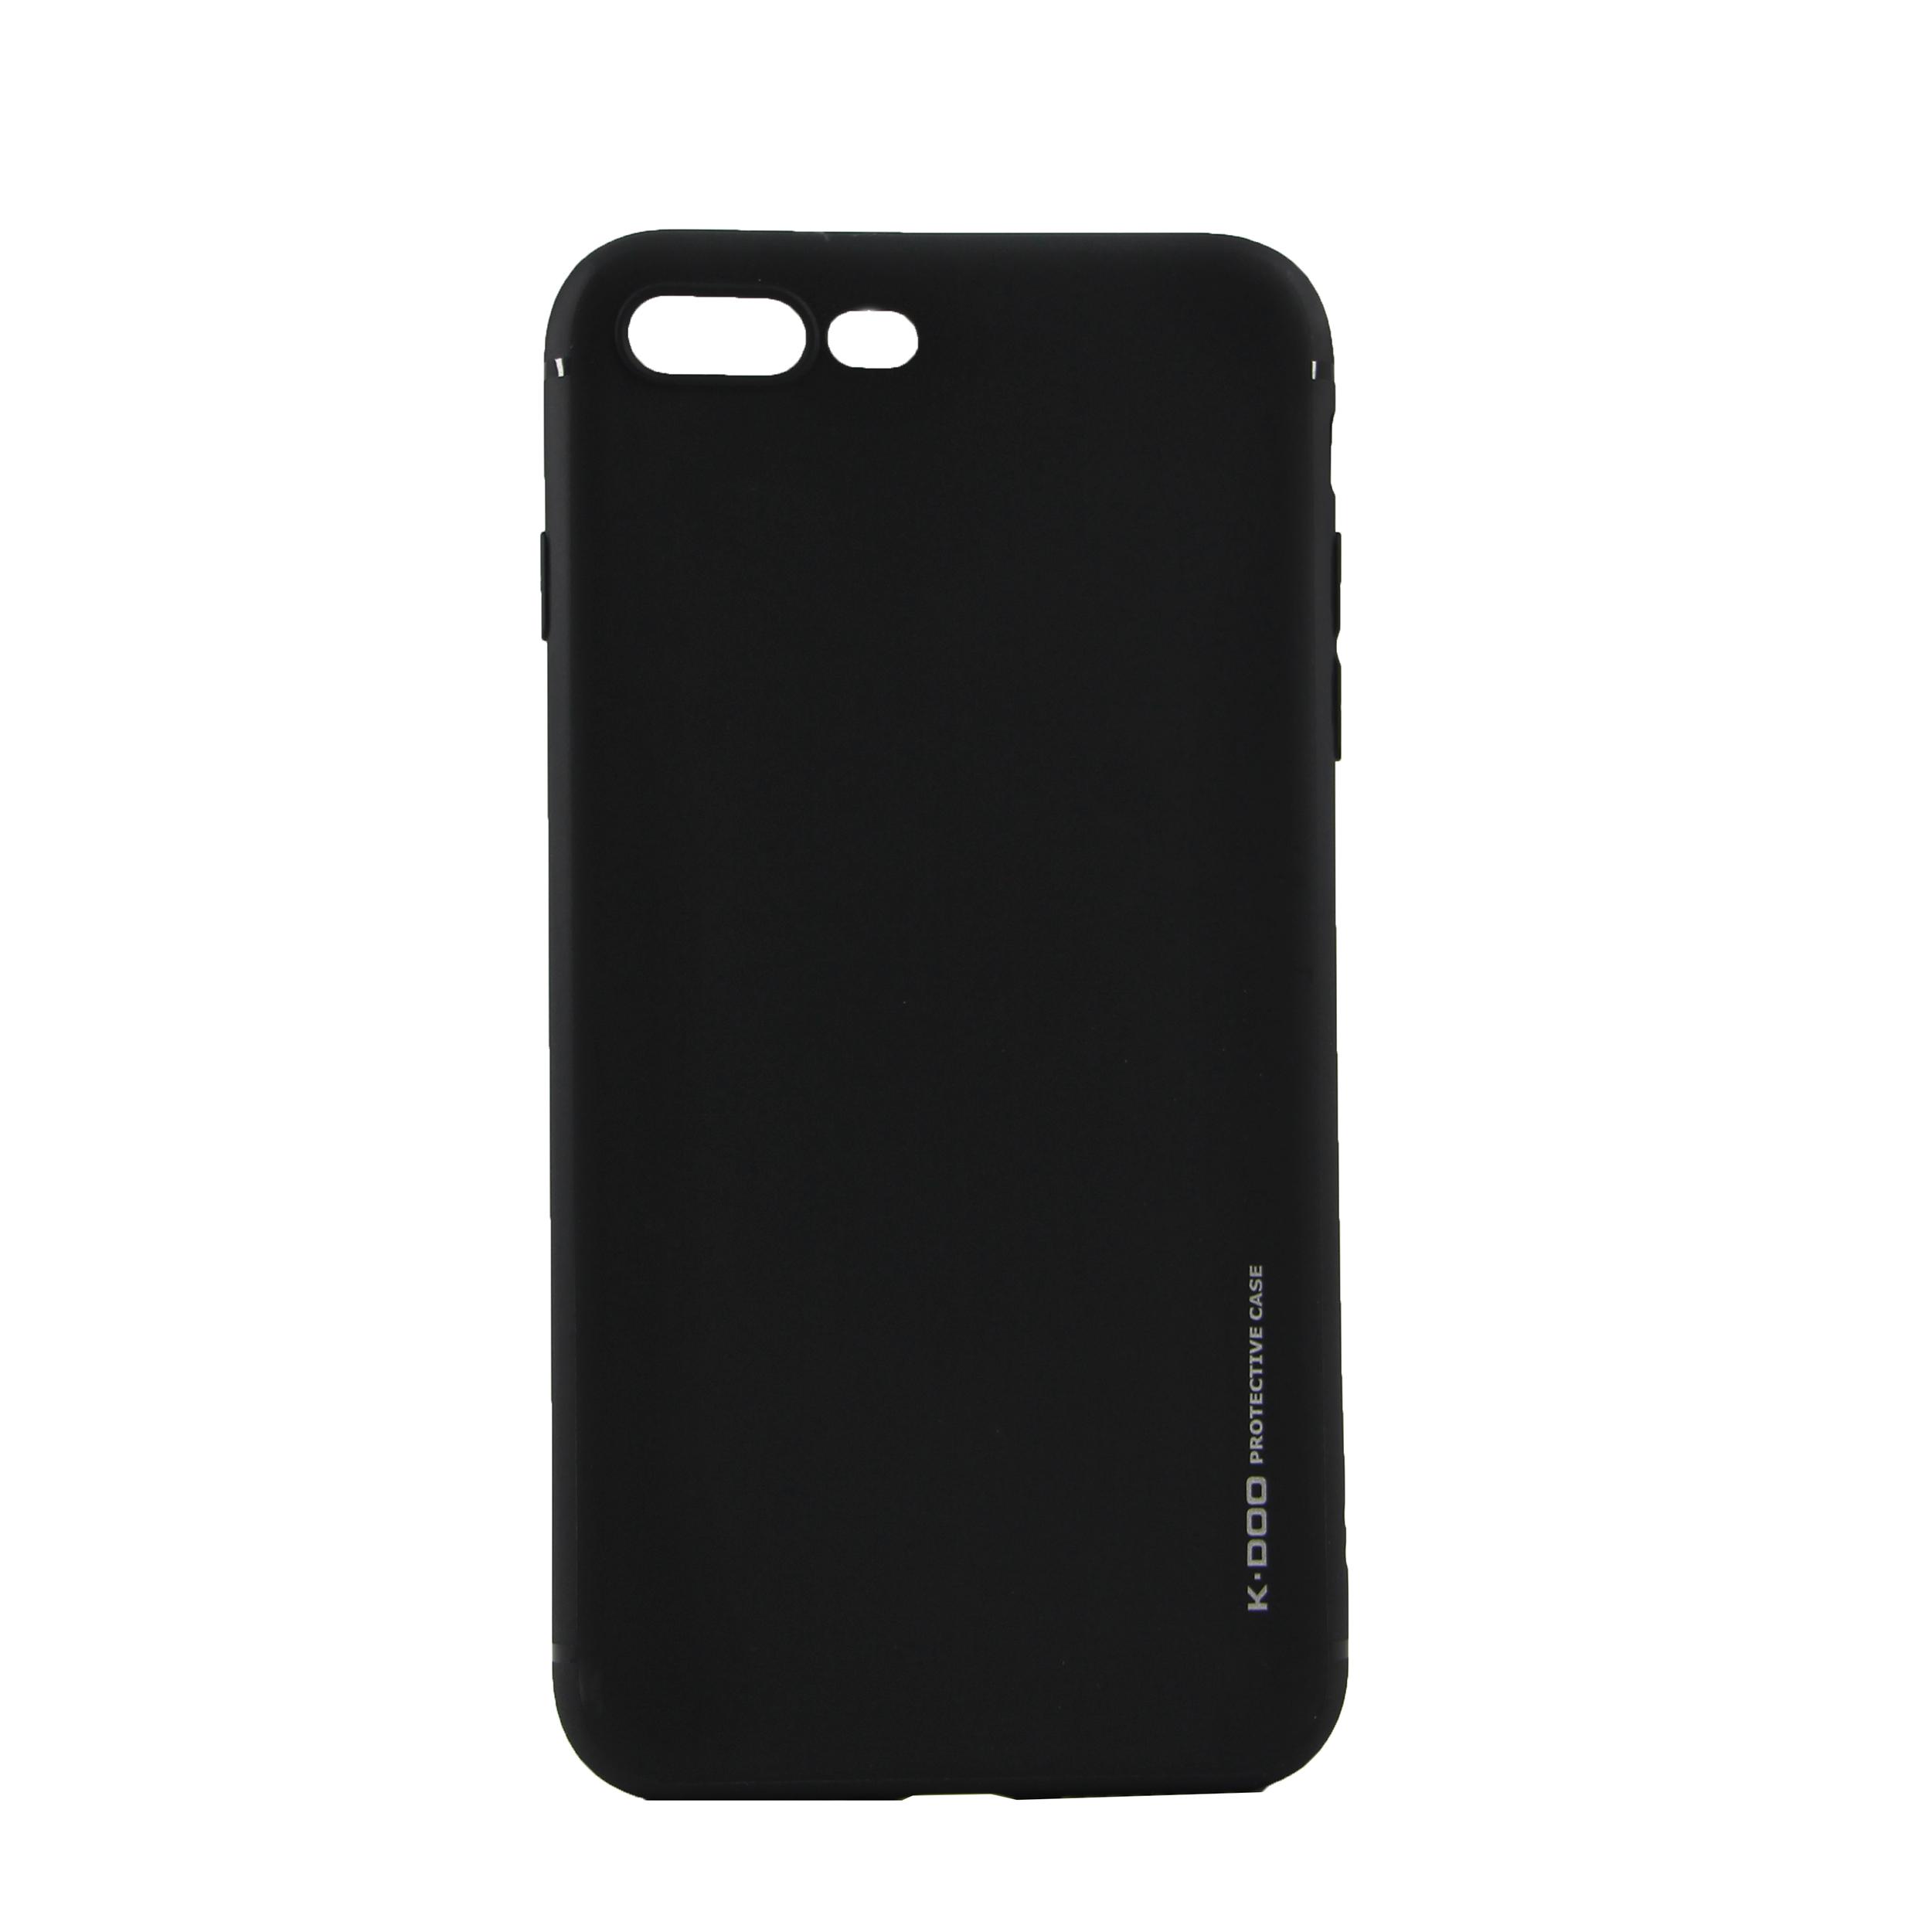 کاور کی -دوو مدل JACKET مناسب برای گوشی موبایل اپل iPhone 7 Plus/ 8 Plus